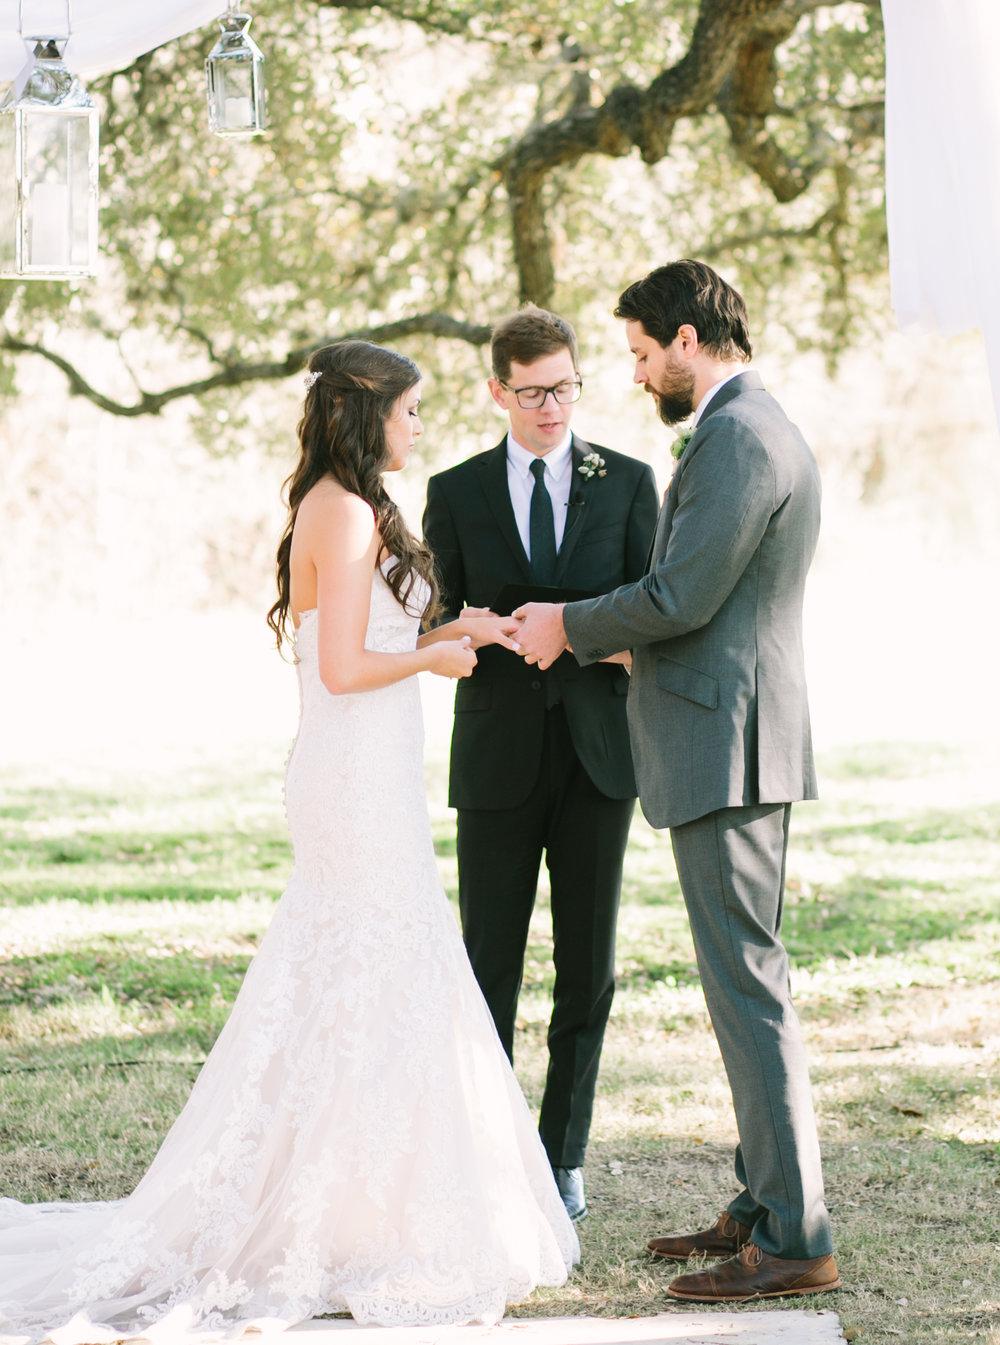 Central Texas Wedding | Vineyards at Chappel Lodge | Fine Art | Emilie Anne Photography-6.jpg